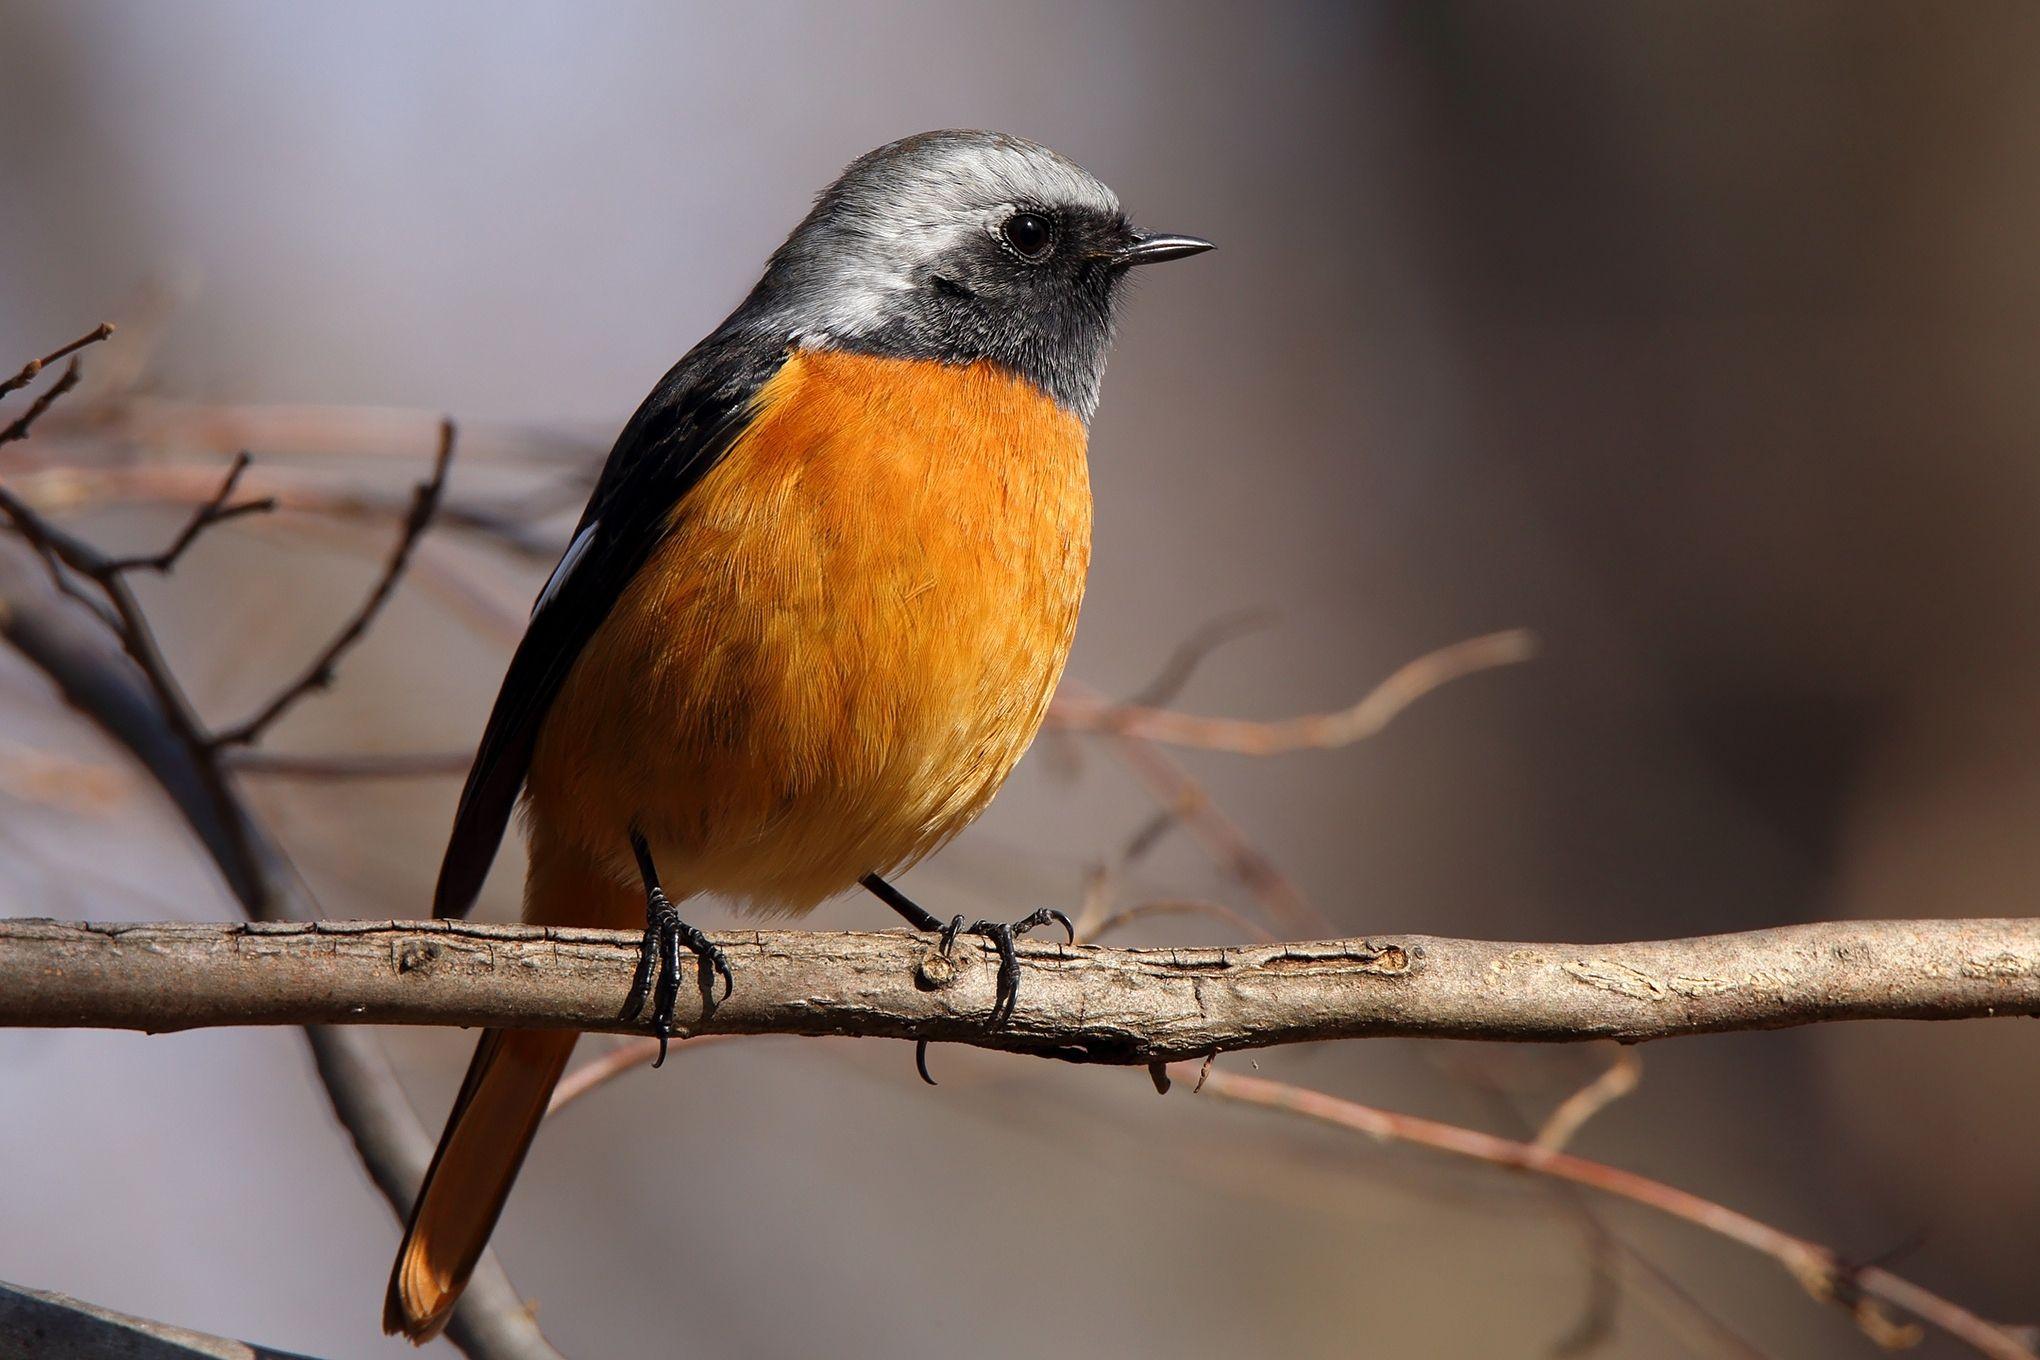 Scientific name: Phoenicurus auroreus (Pallas, 1776).  English name: Daurian Redstart.  Japanese name: ジョウビタキ (Jou-bitaki).